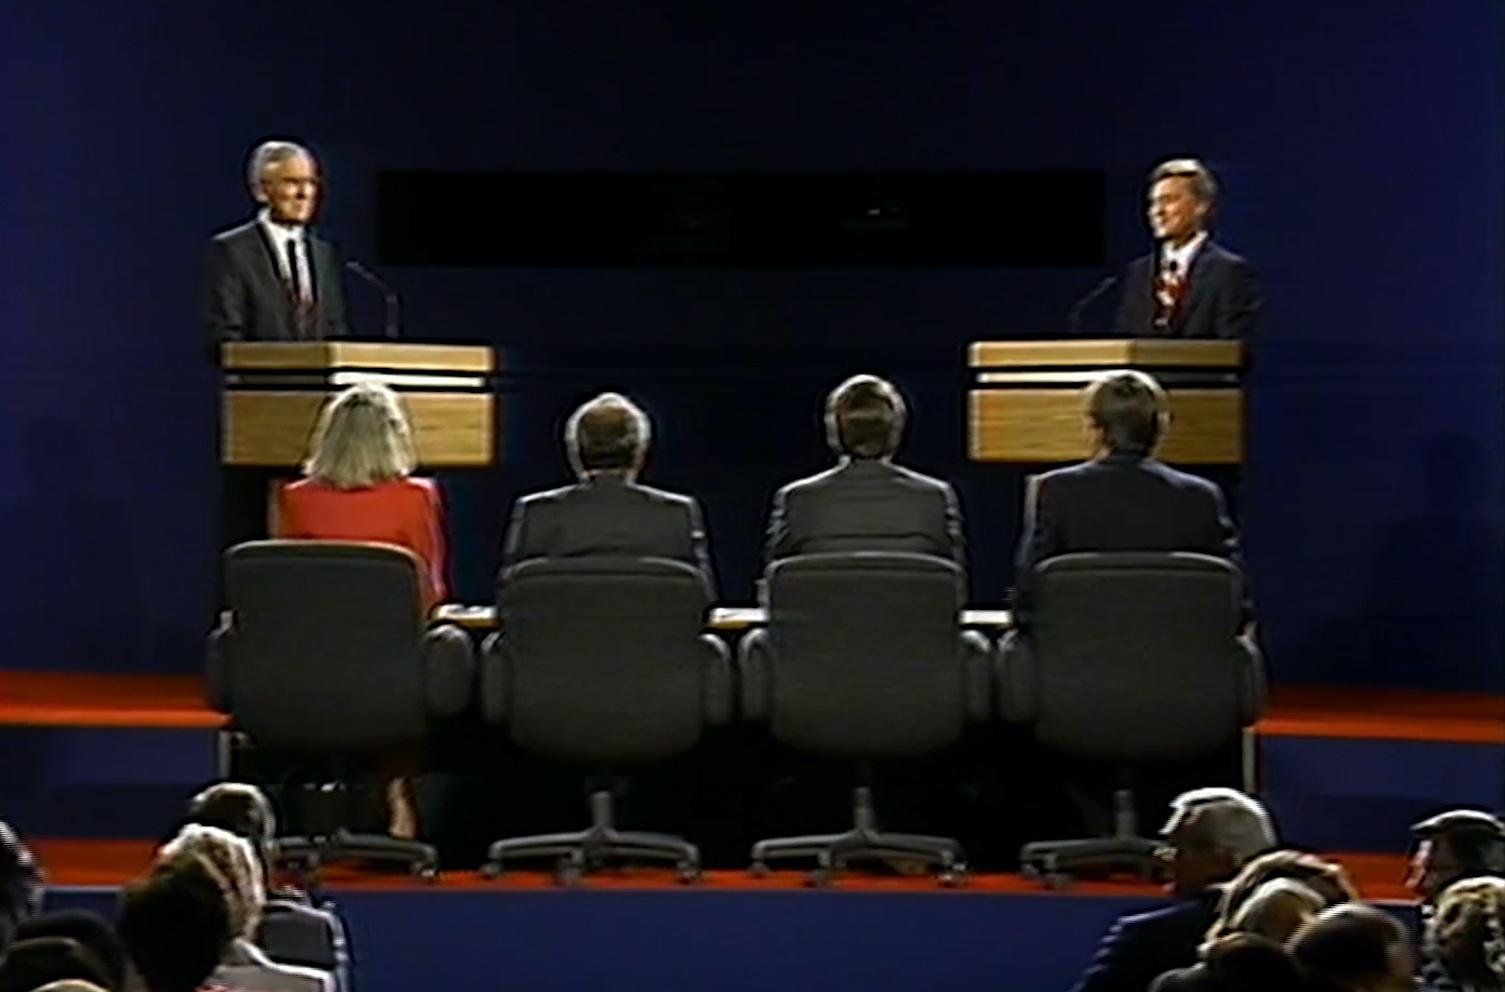 Bentsen vs. Quayle: The 1988 vice presidential debate